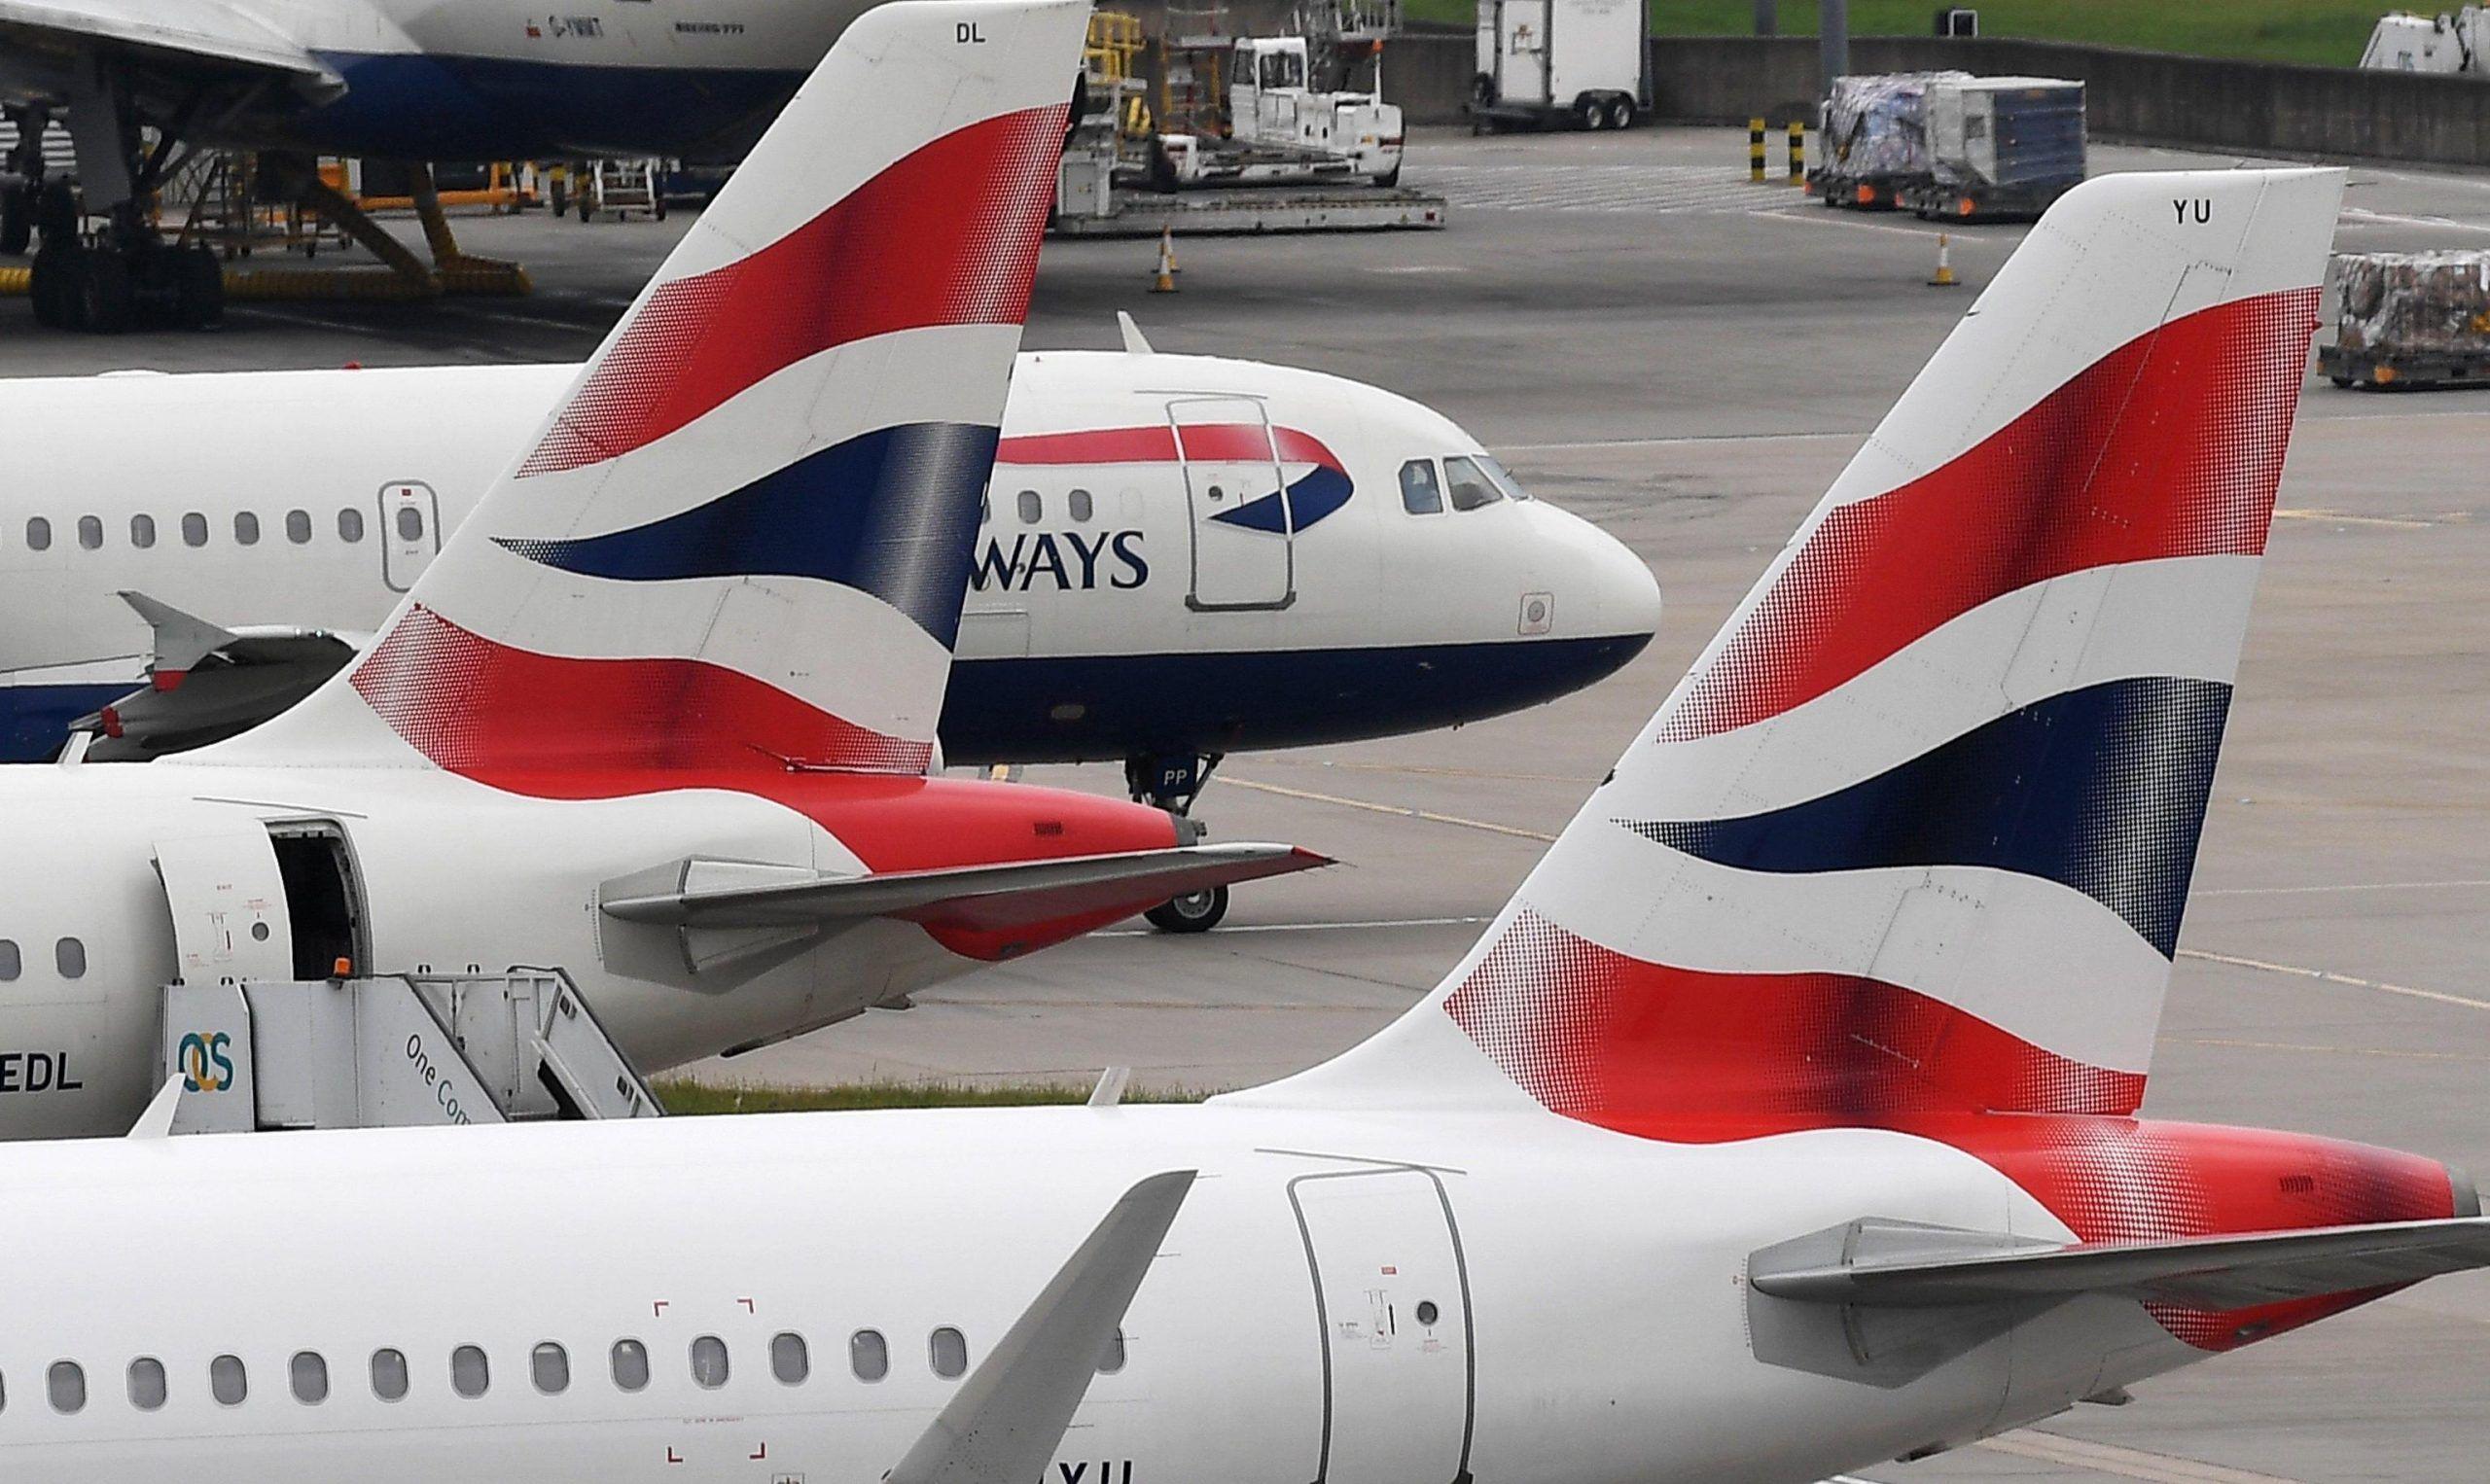 British Airways passengers enduring third day of delays following a IT meltdown